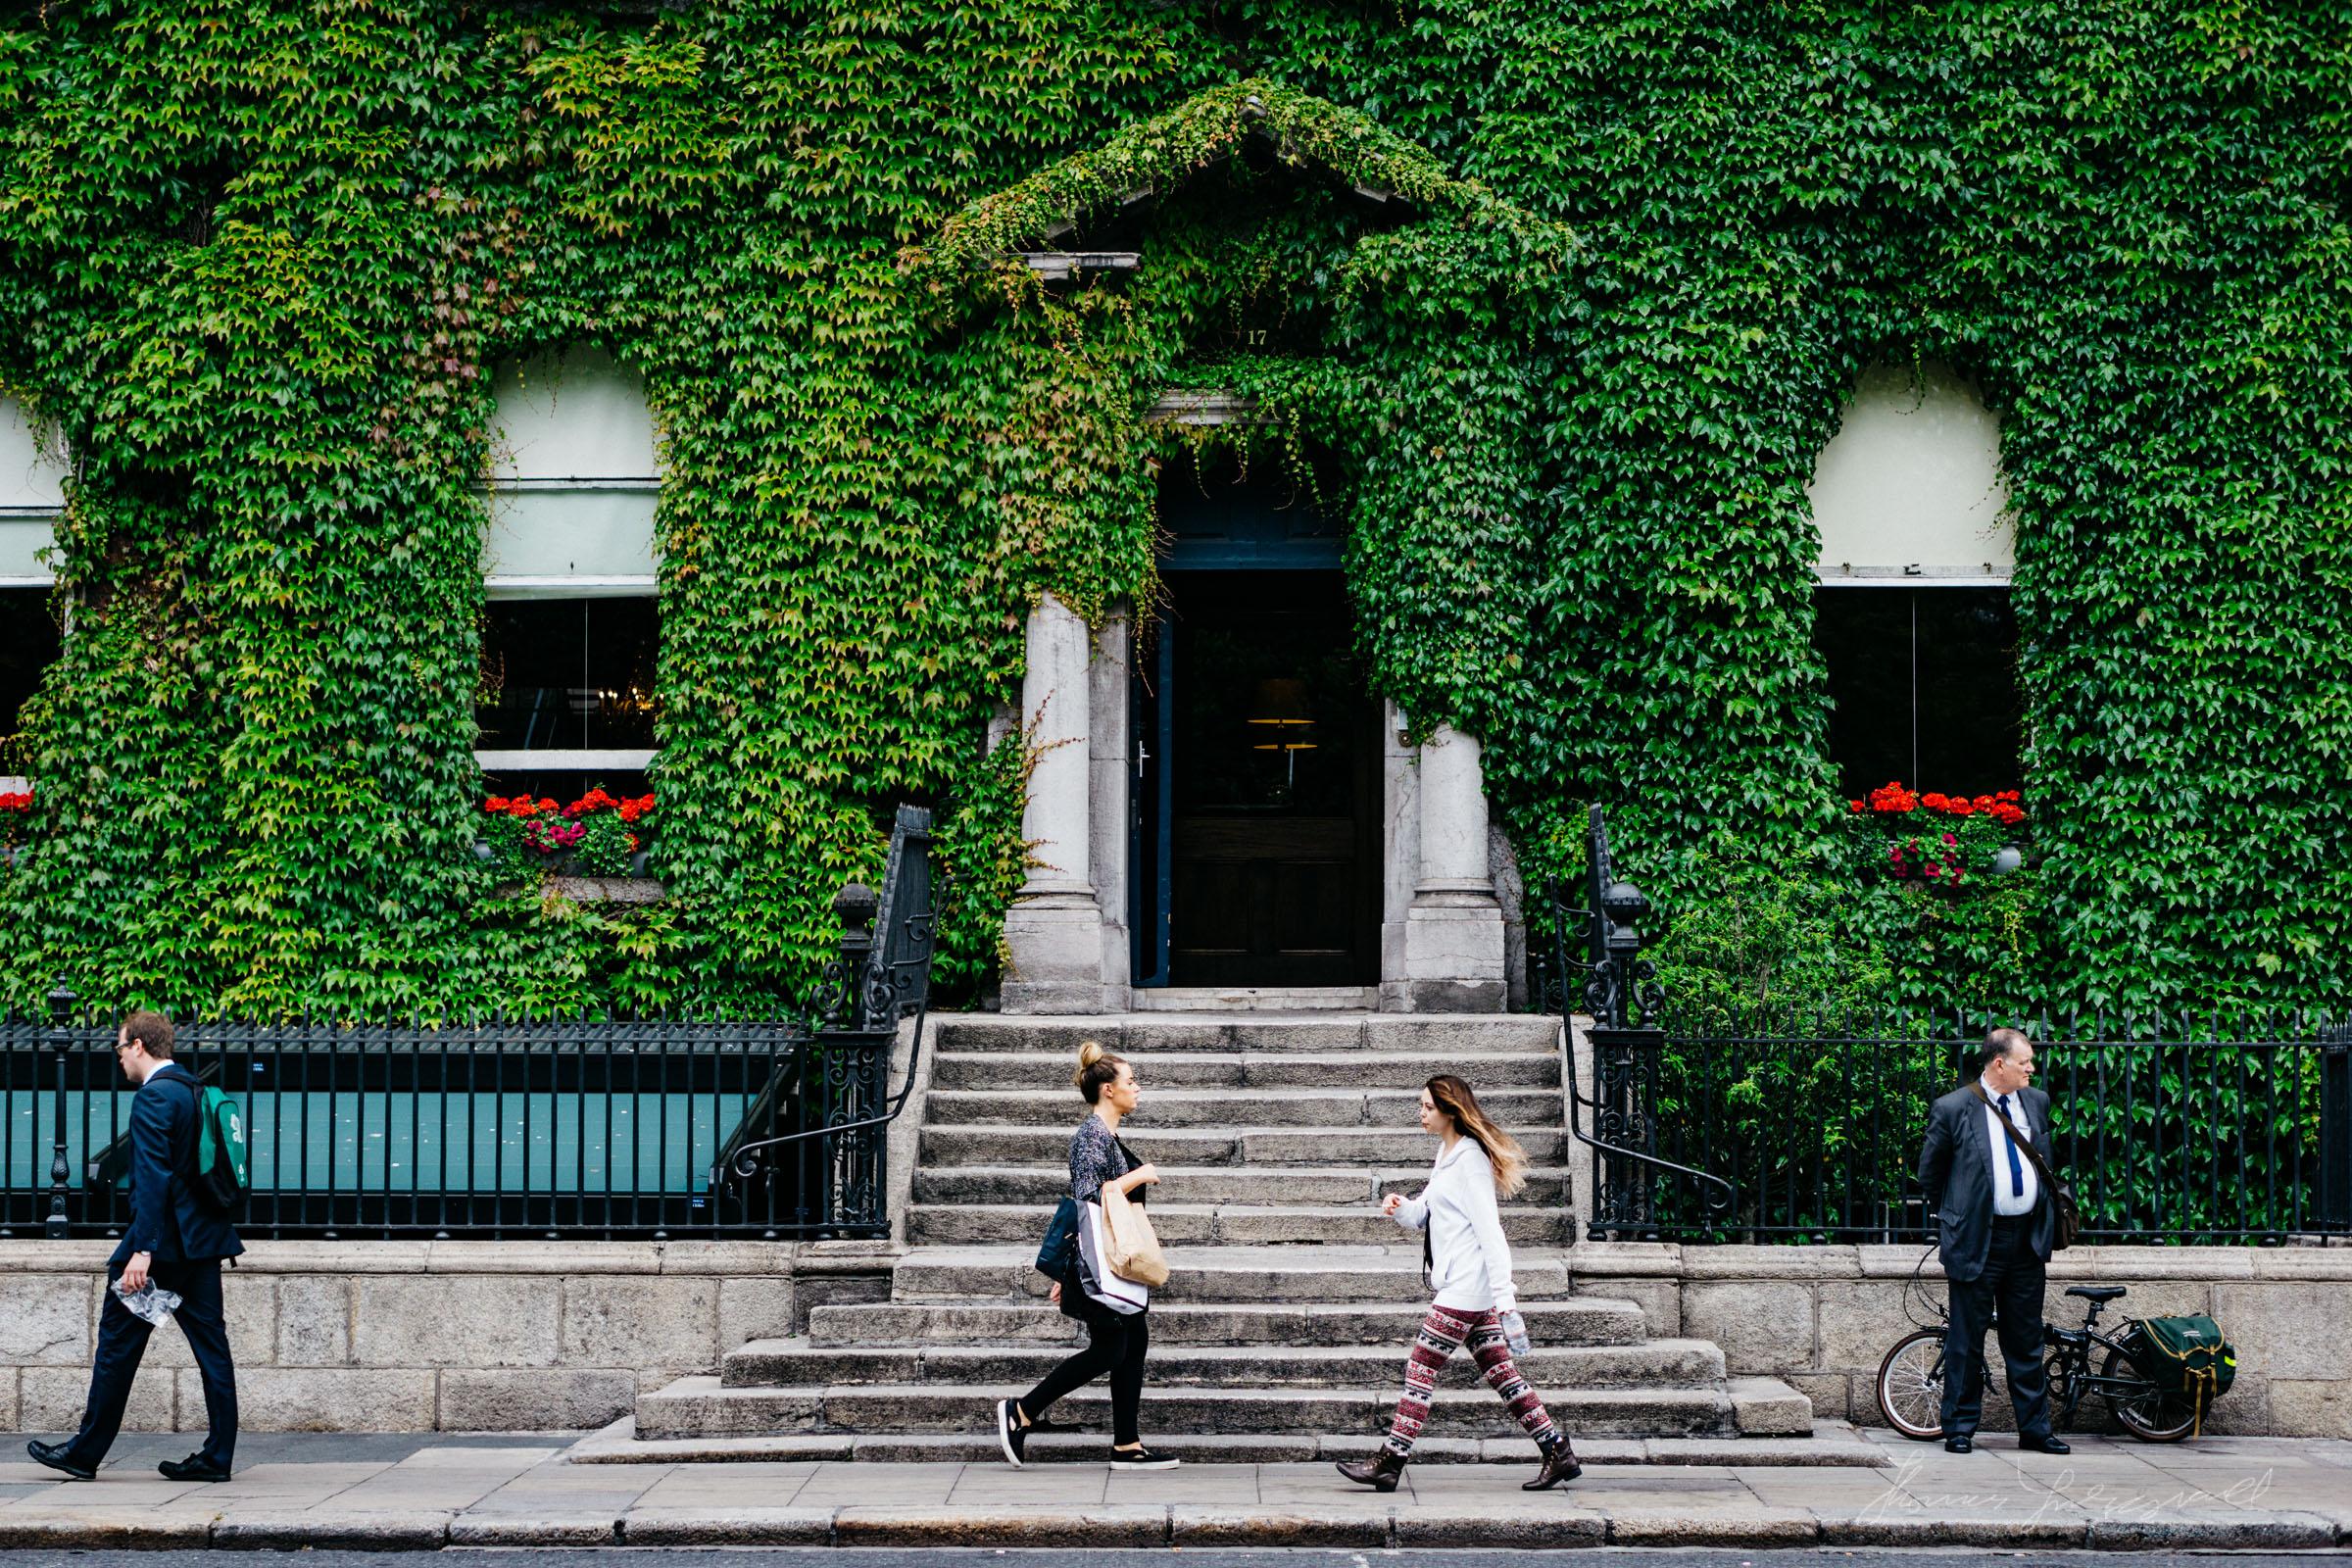 Streets-of-Dublin-Photo-04184.jpg